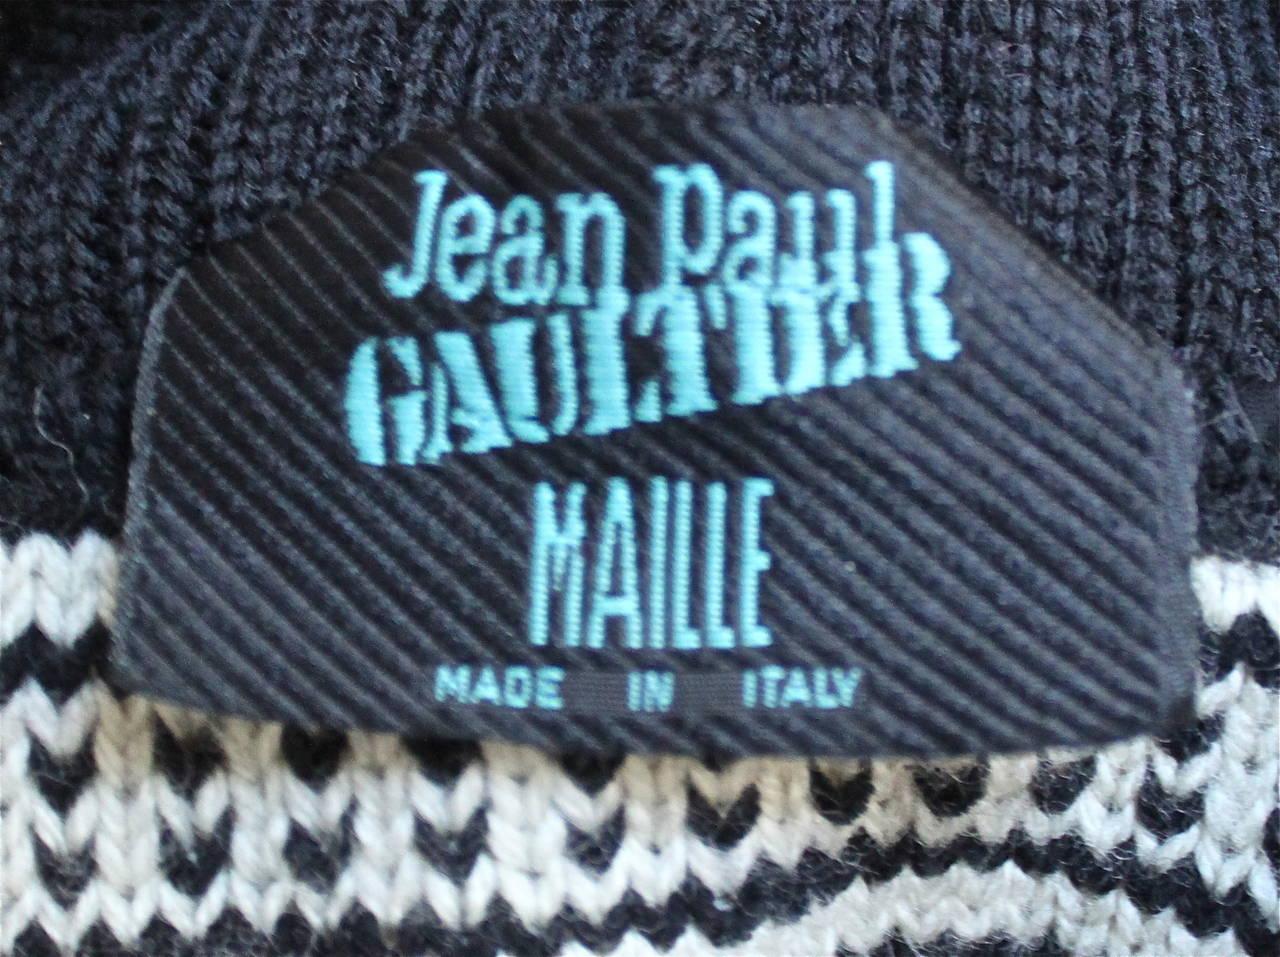 1994 JEAN PAUL GAULTIER 'le grande voyage' runway sweater. 3